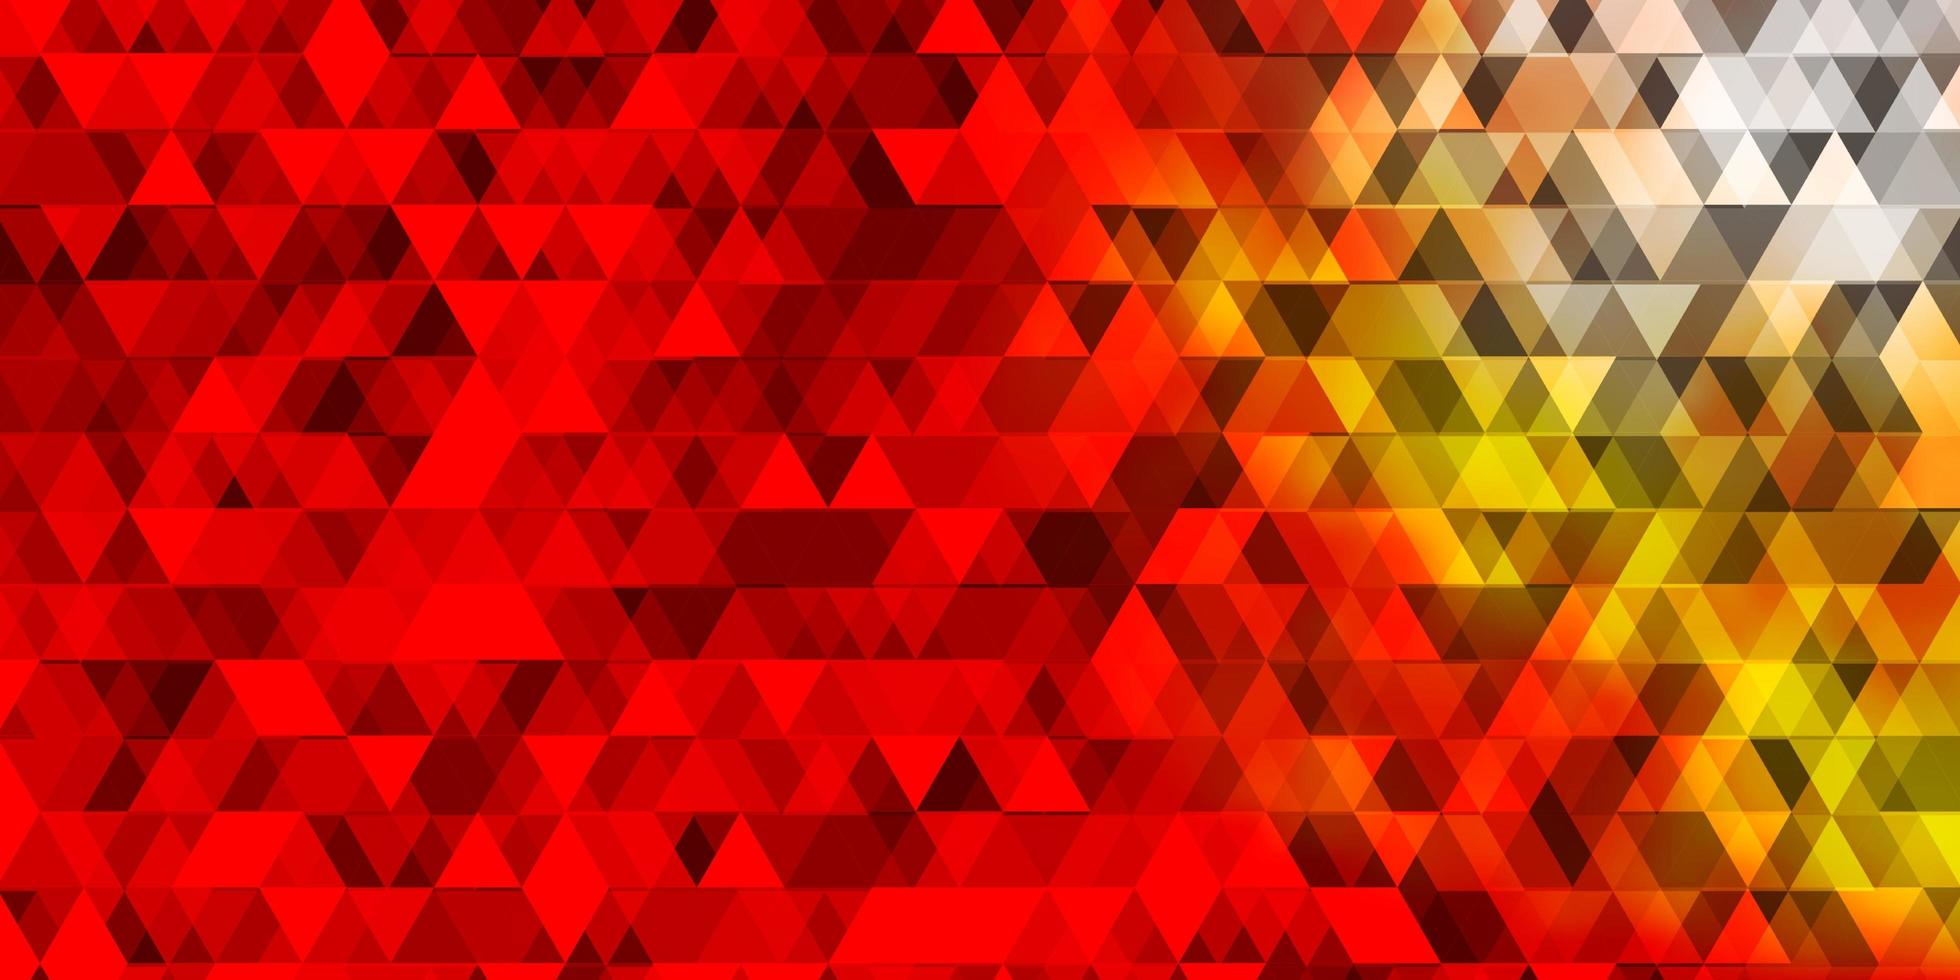 textura vector laranja claro com linhas, triângulos.